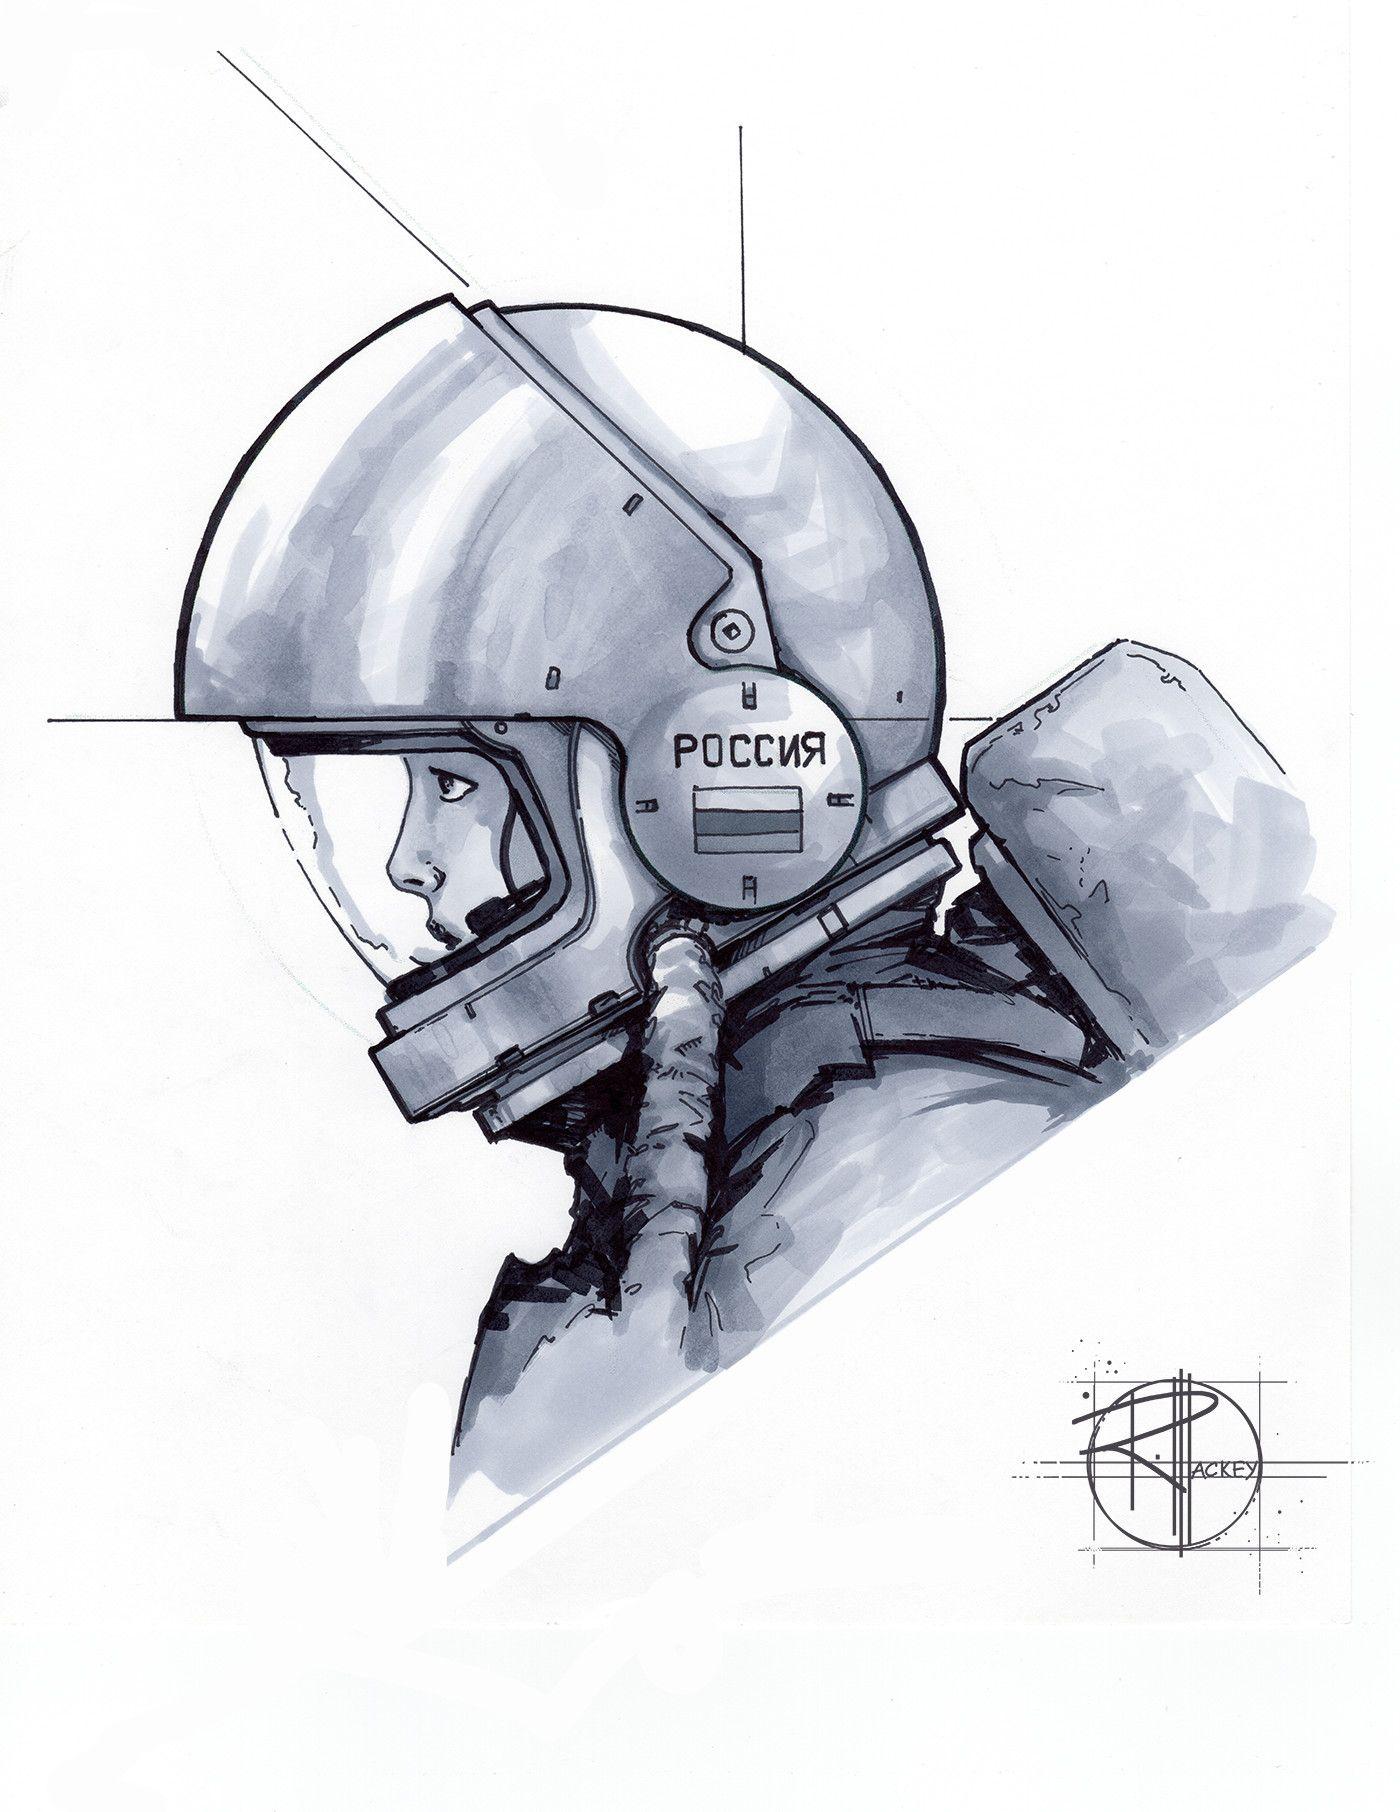 Astronaut Helmet Drawing : astronaut, helmet, drawing, Second, Design, Phase., Vehicles, Bespin, Cloud, Cars., Would, Space, Drawings,, Helmet, Drawing,, Astronaut